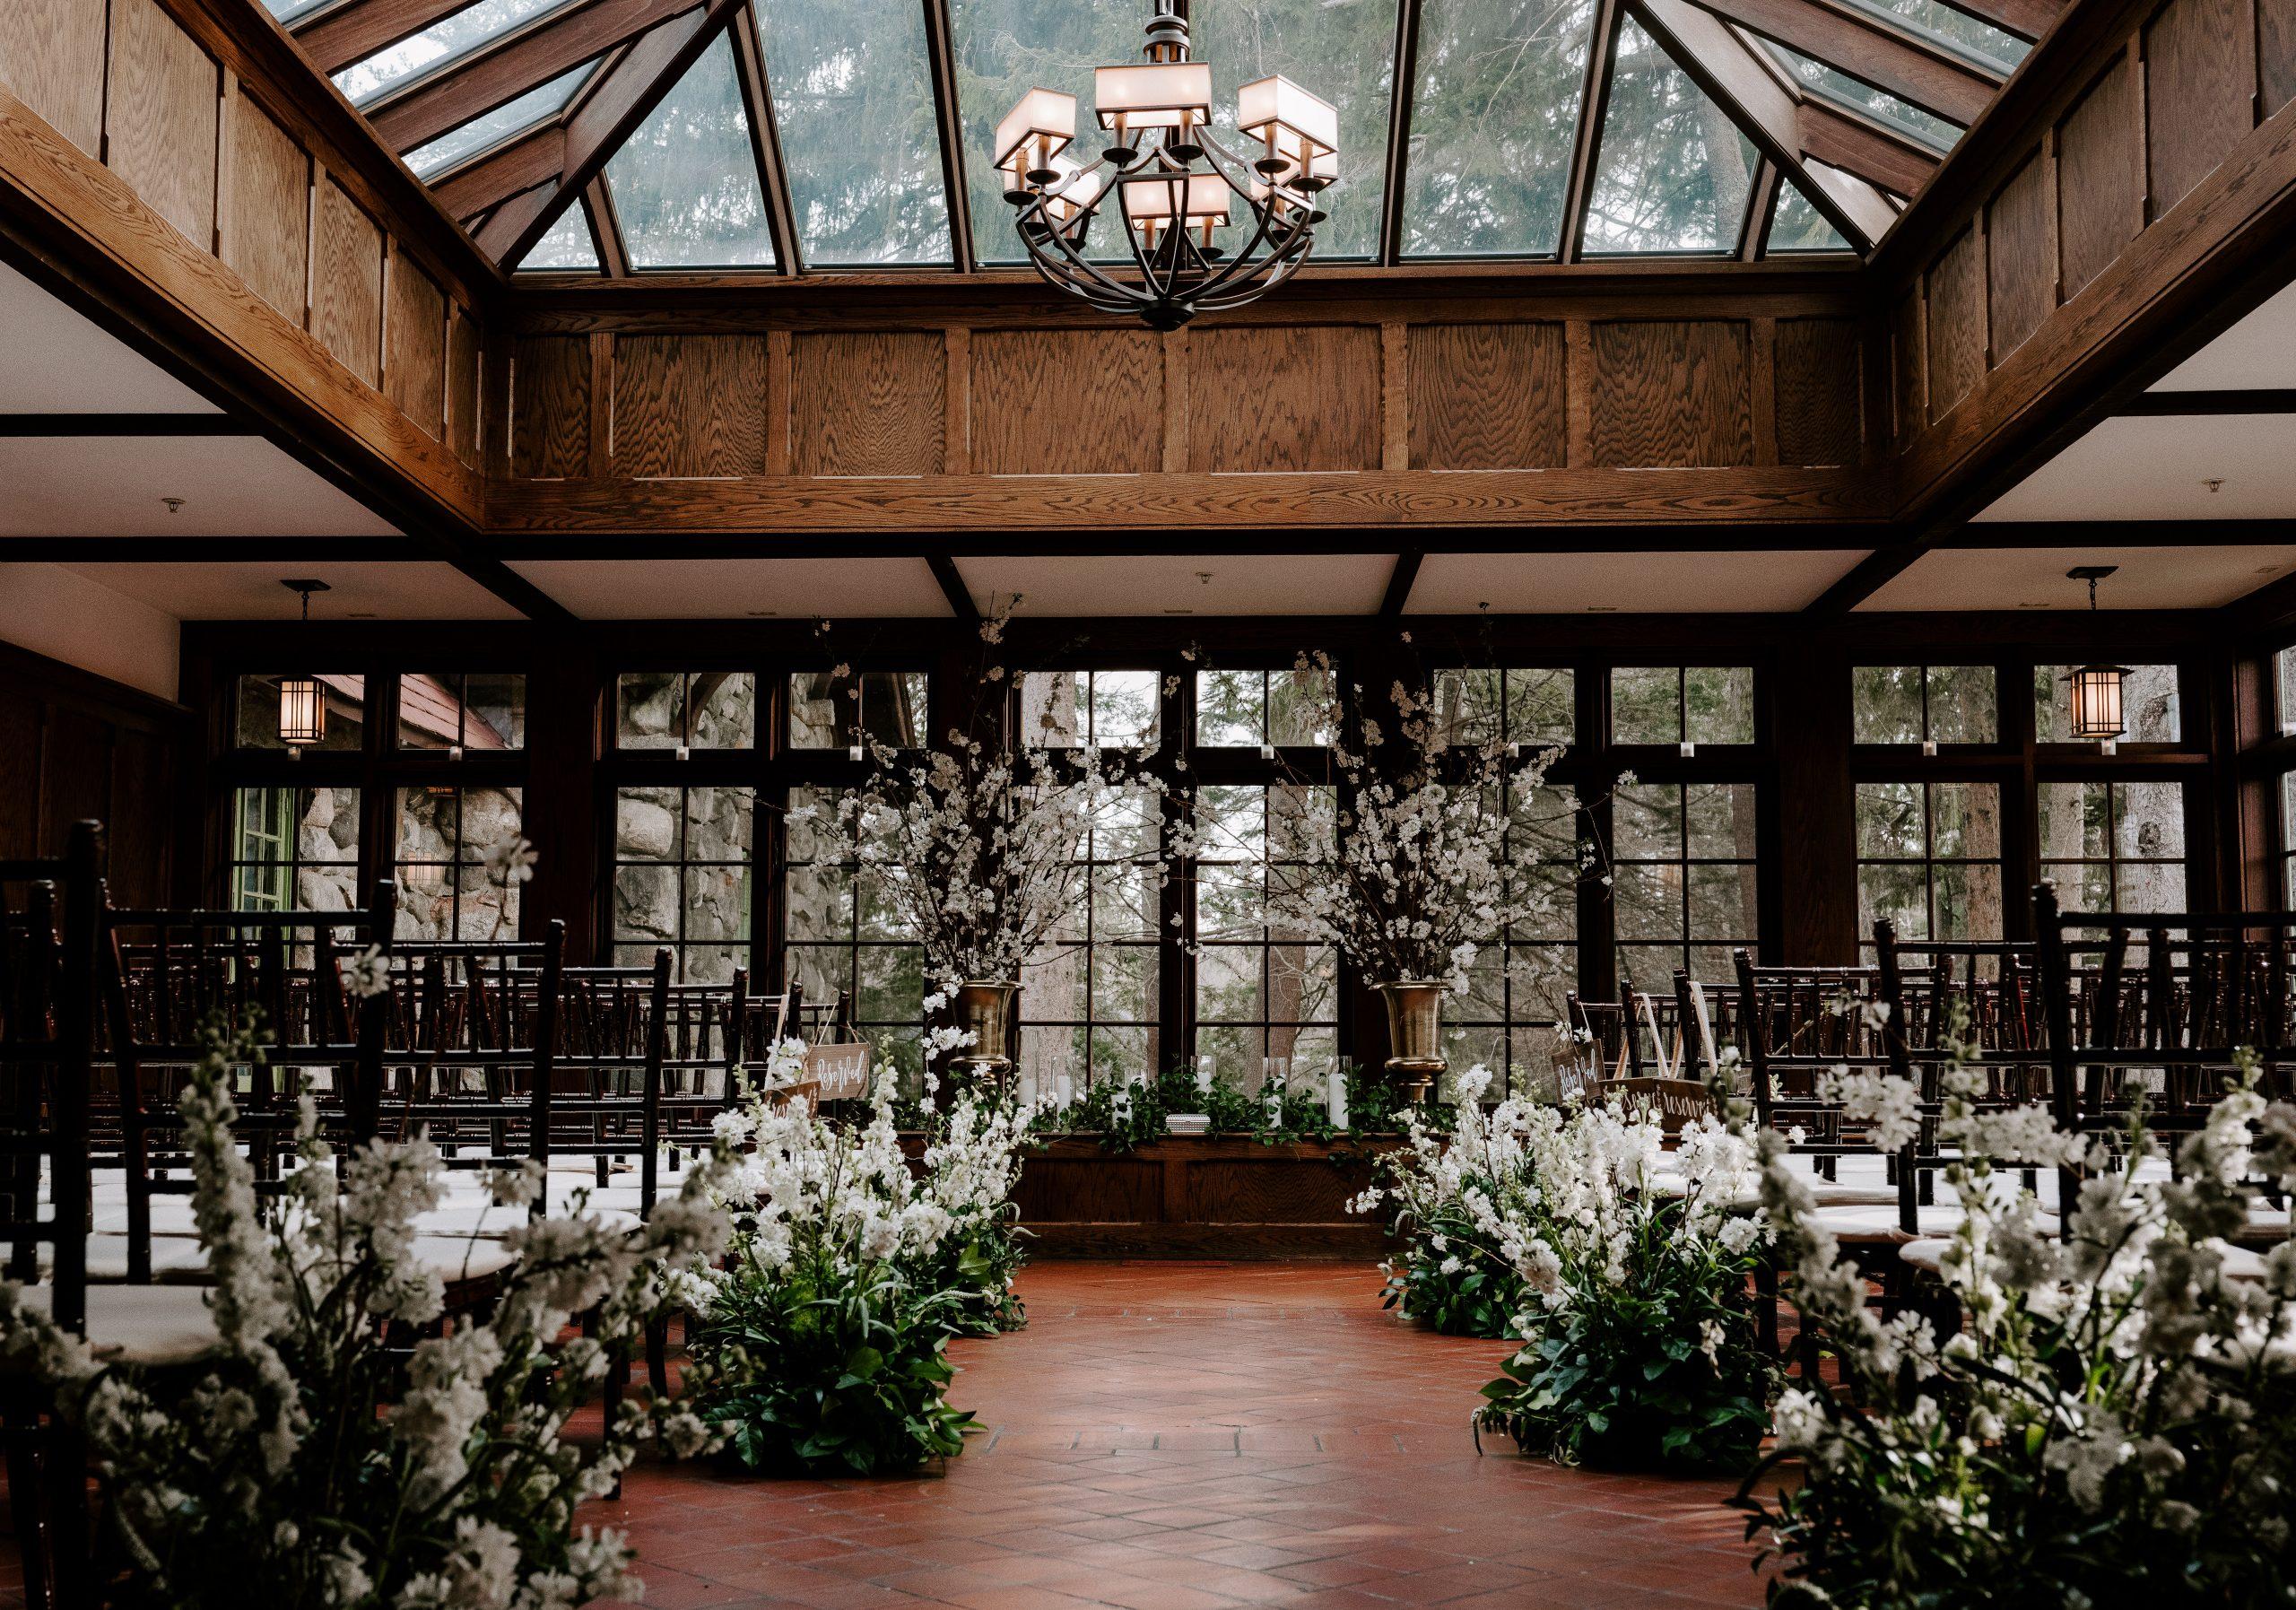 willowdale estate indoor wedding venue